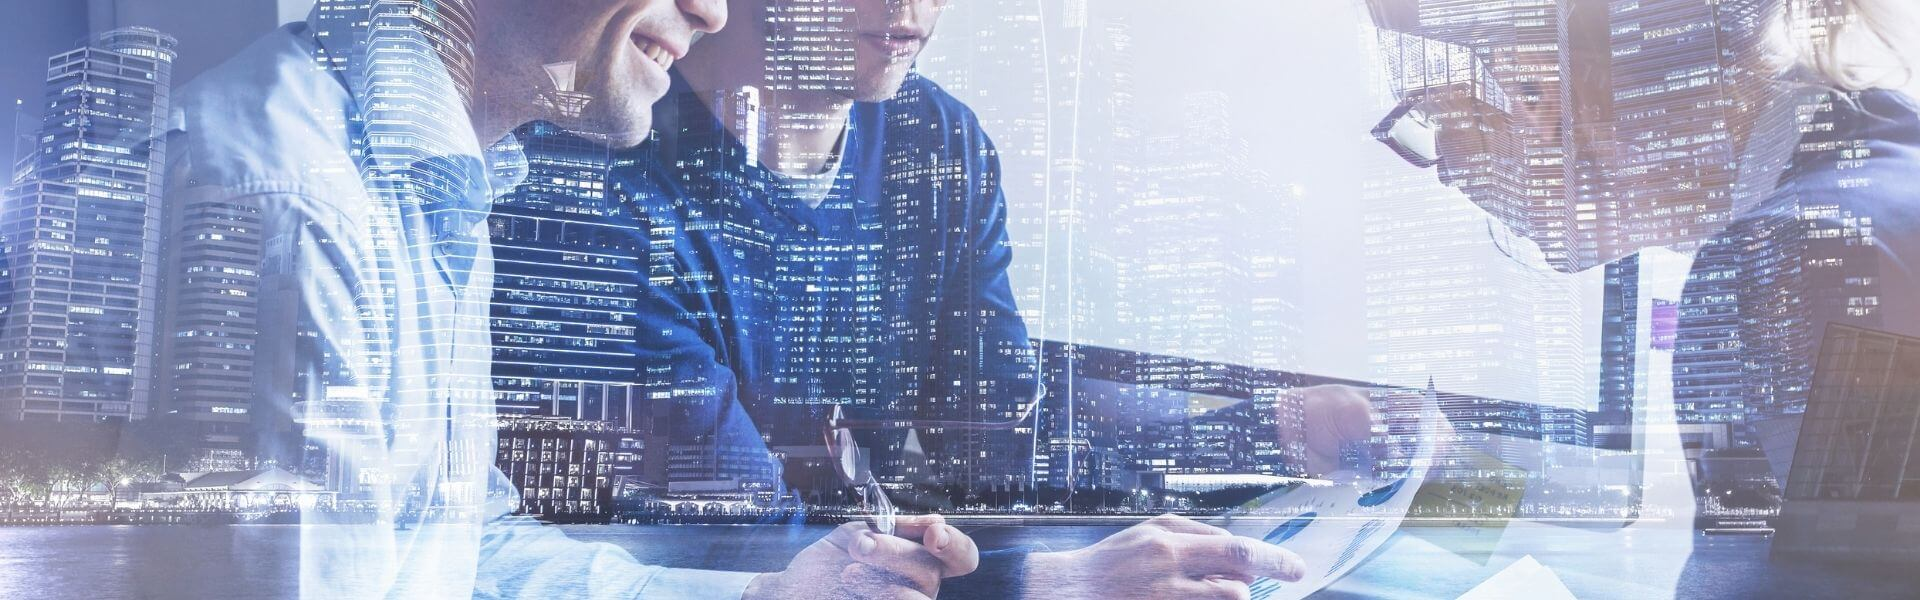 Fachgruppe Digitalisierung